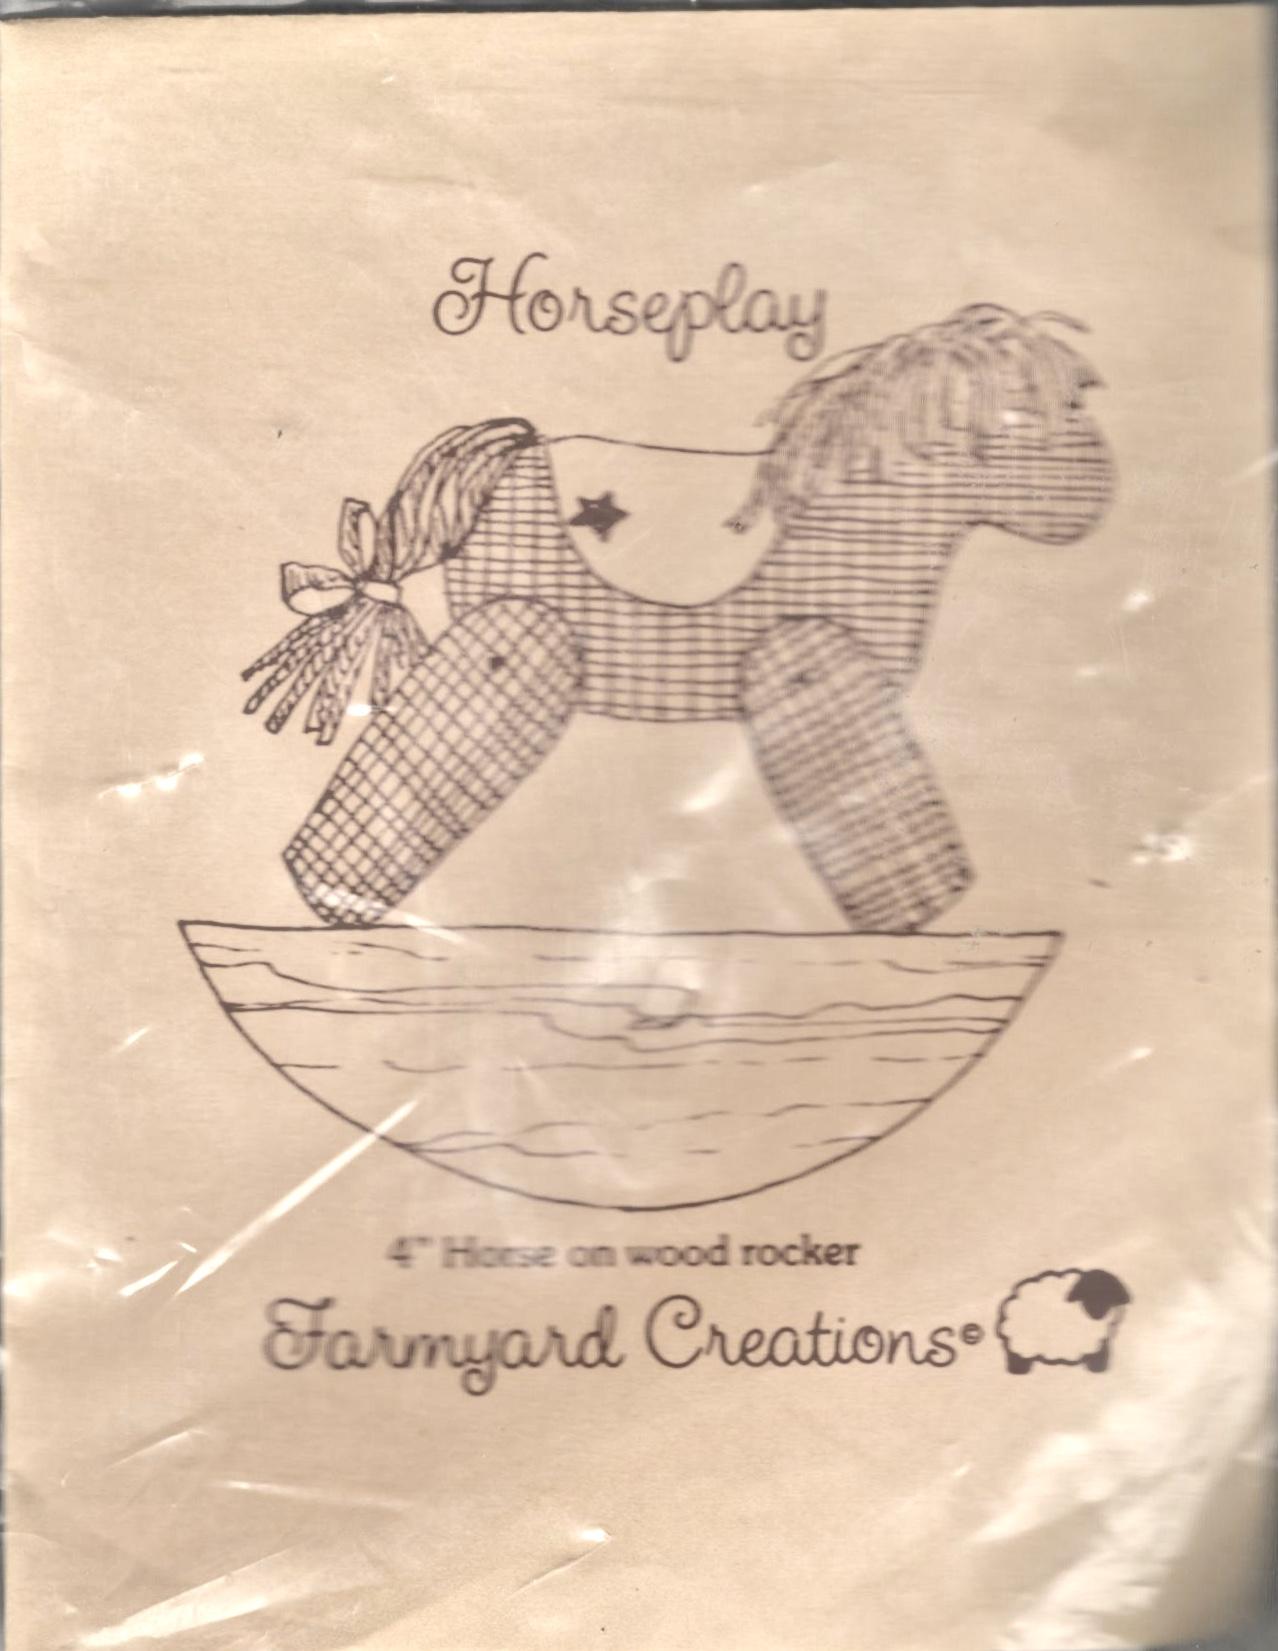 Farmyard Creations Horseplay